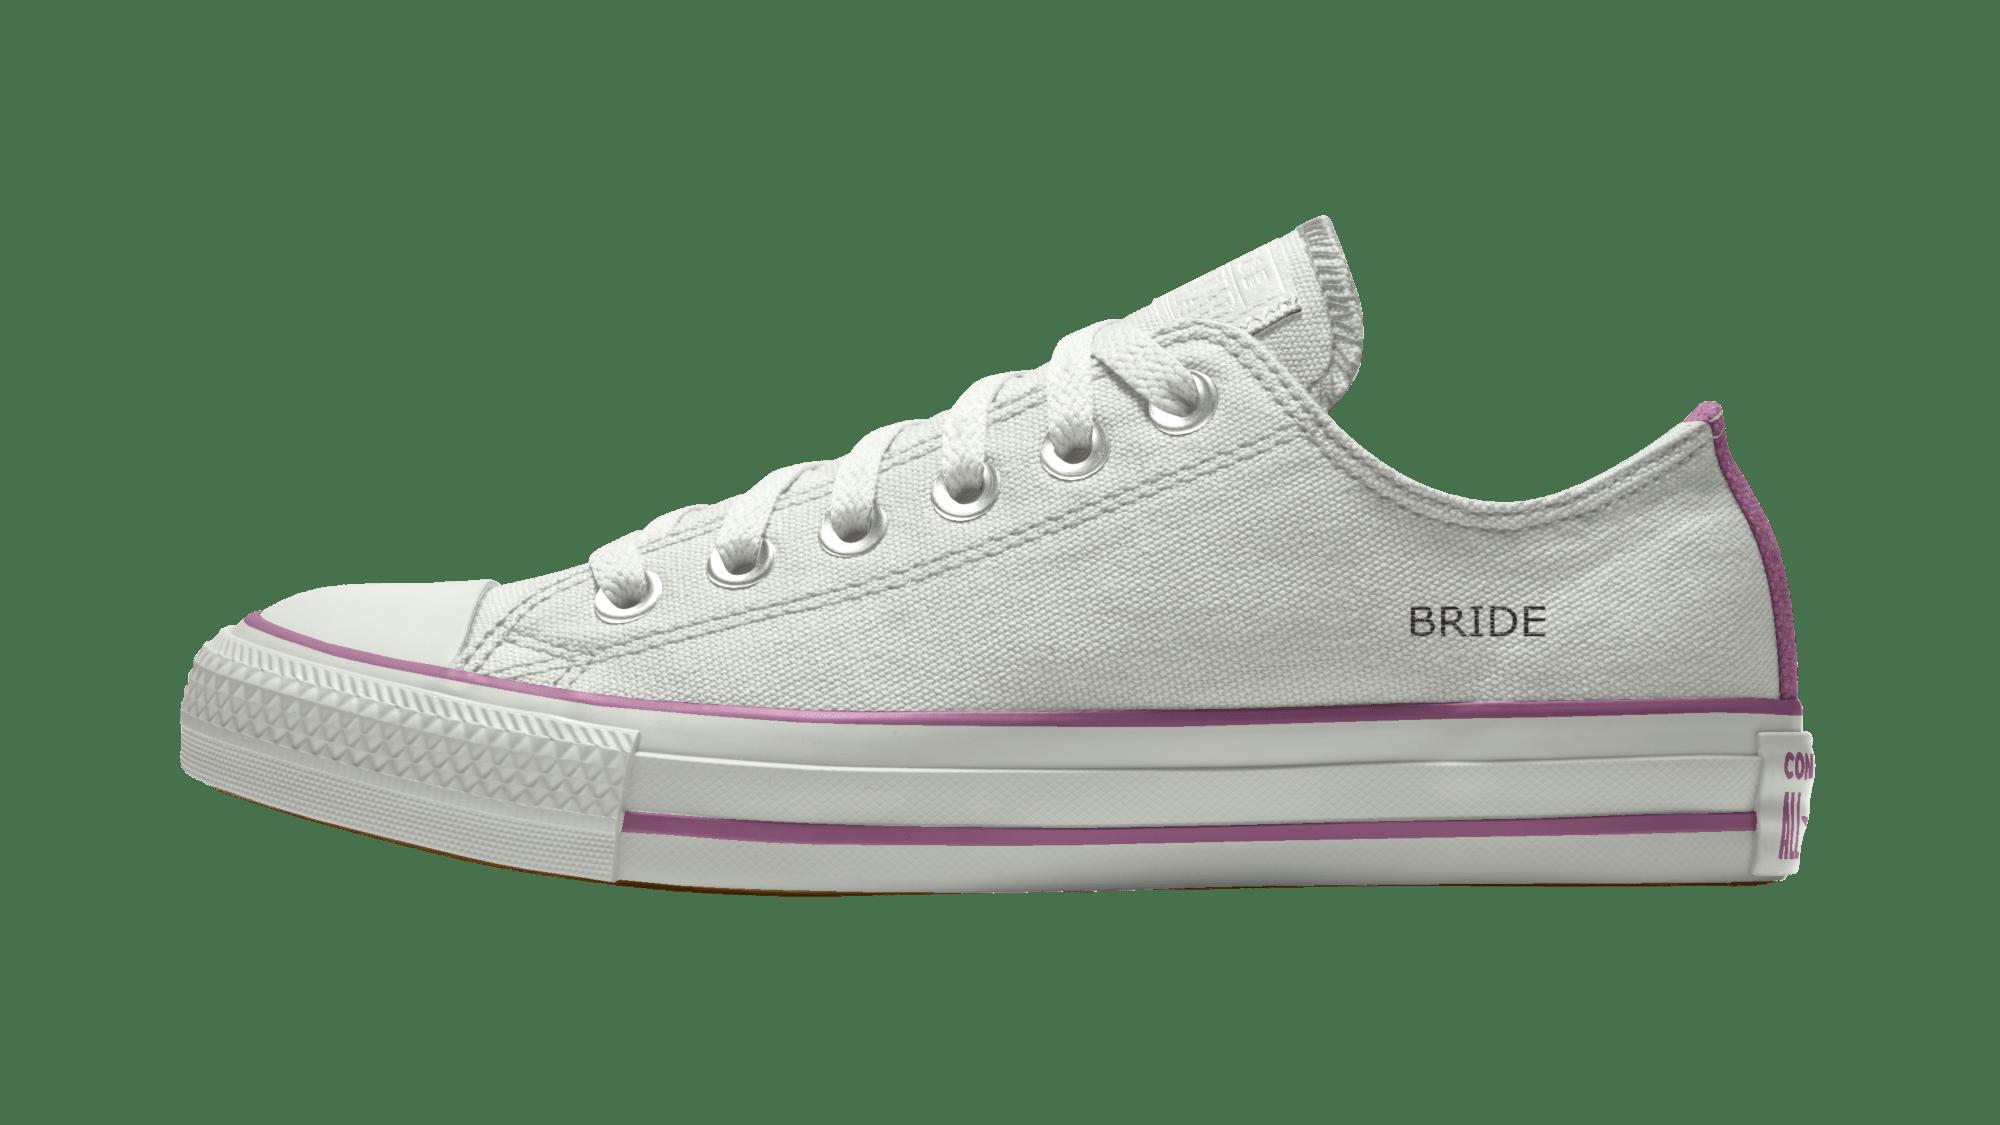 converse-chuck-taylor-all-star-wedding-collection